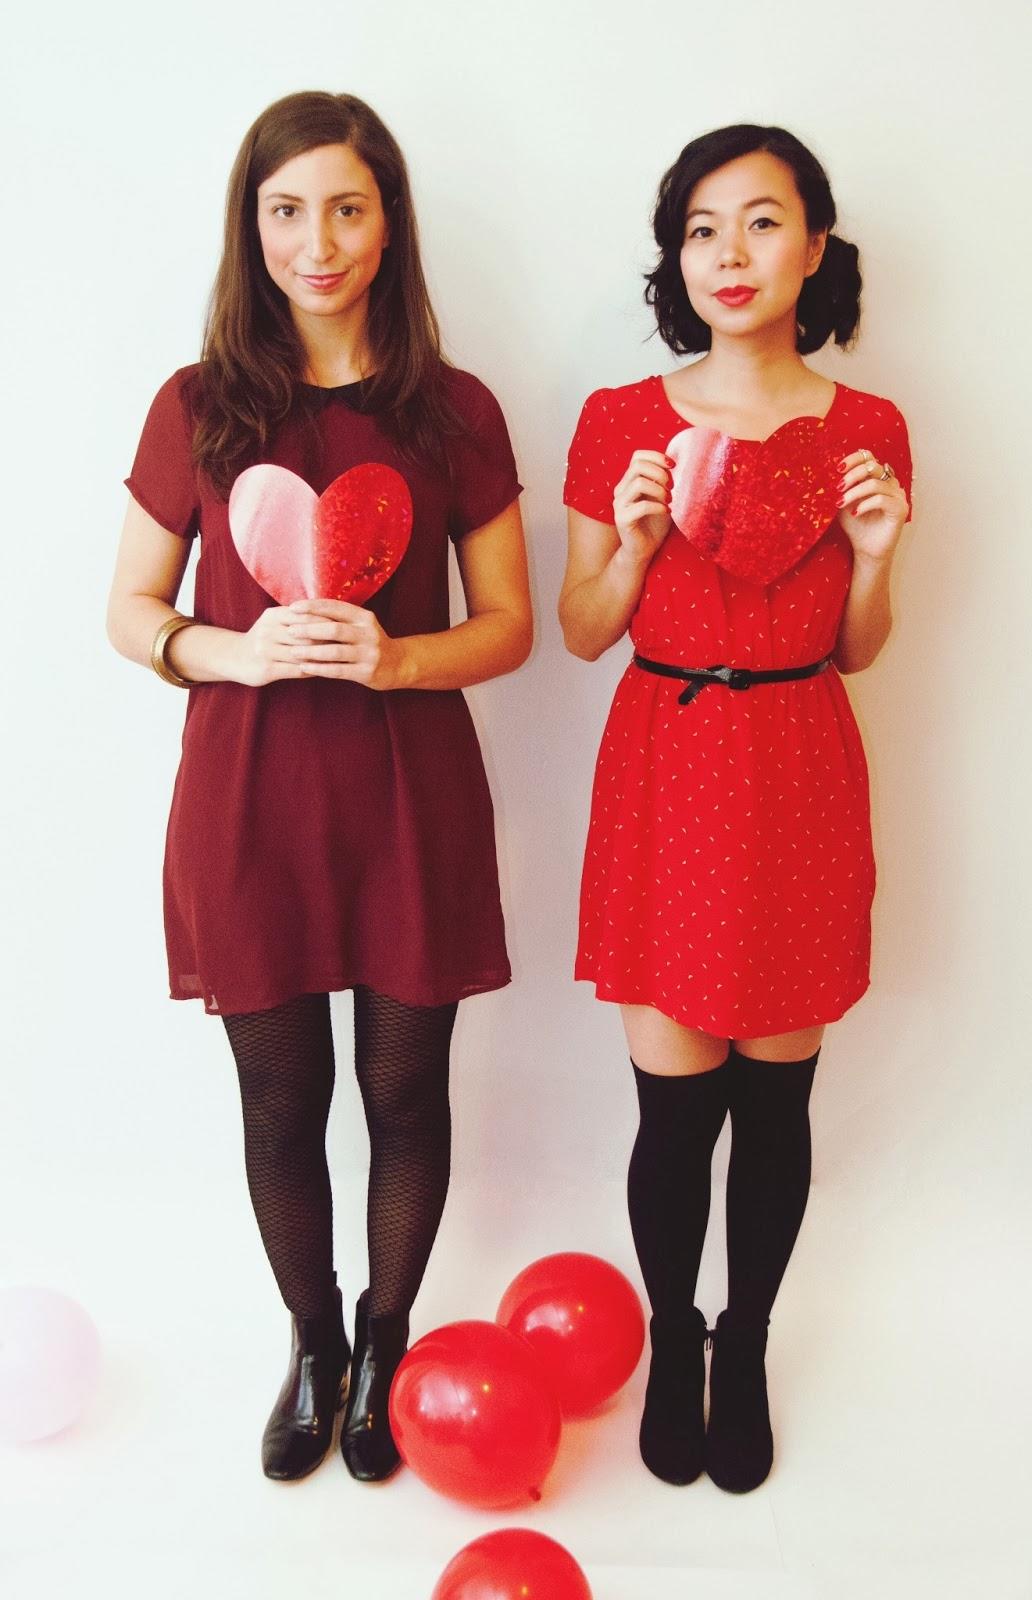 maroon dress peter pan collar red belt black bootie valentine's day hearts love